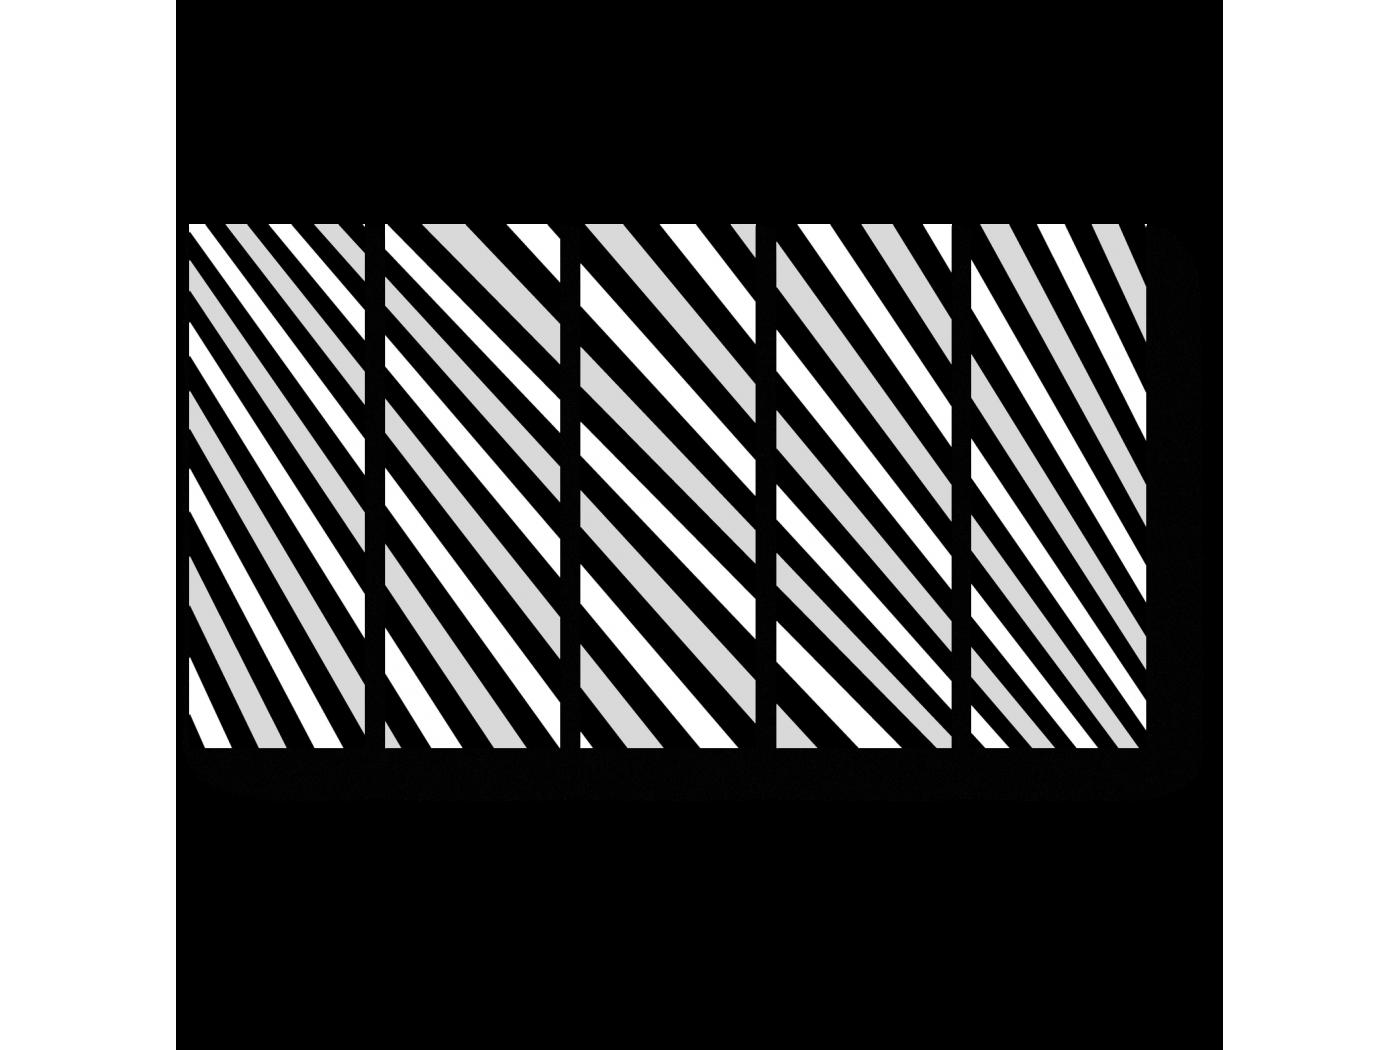 Модульная картина Иллюзия (90x54) фото